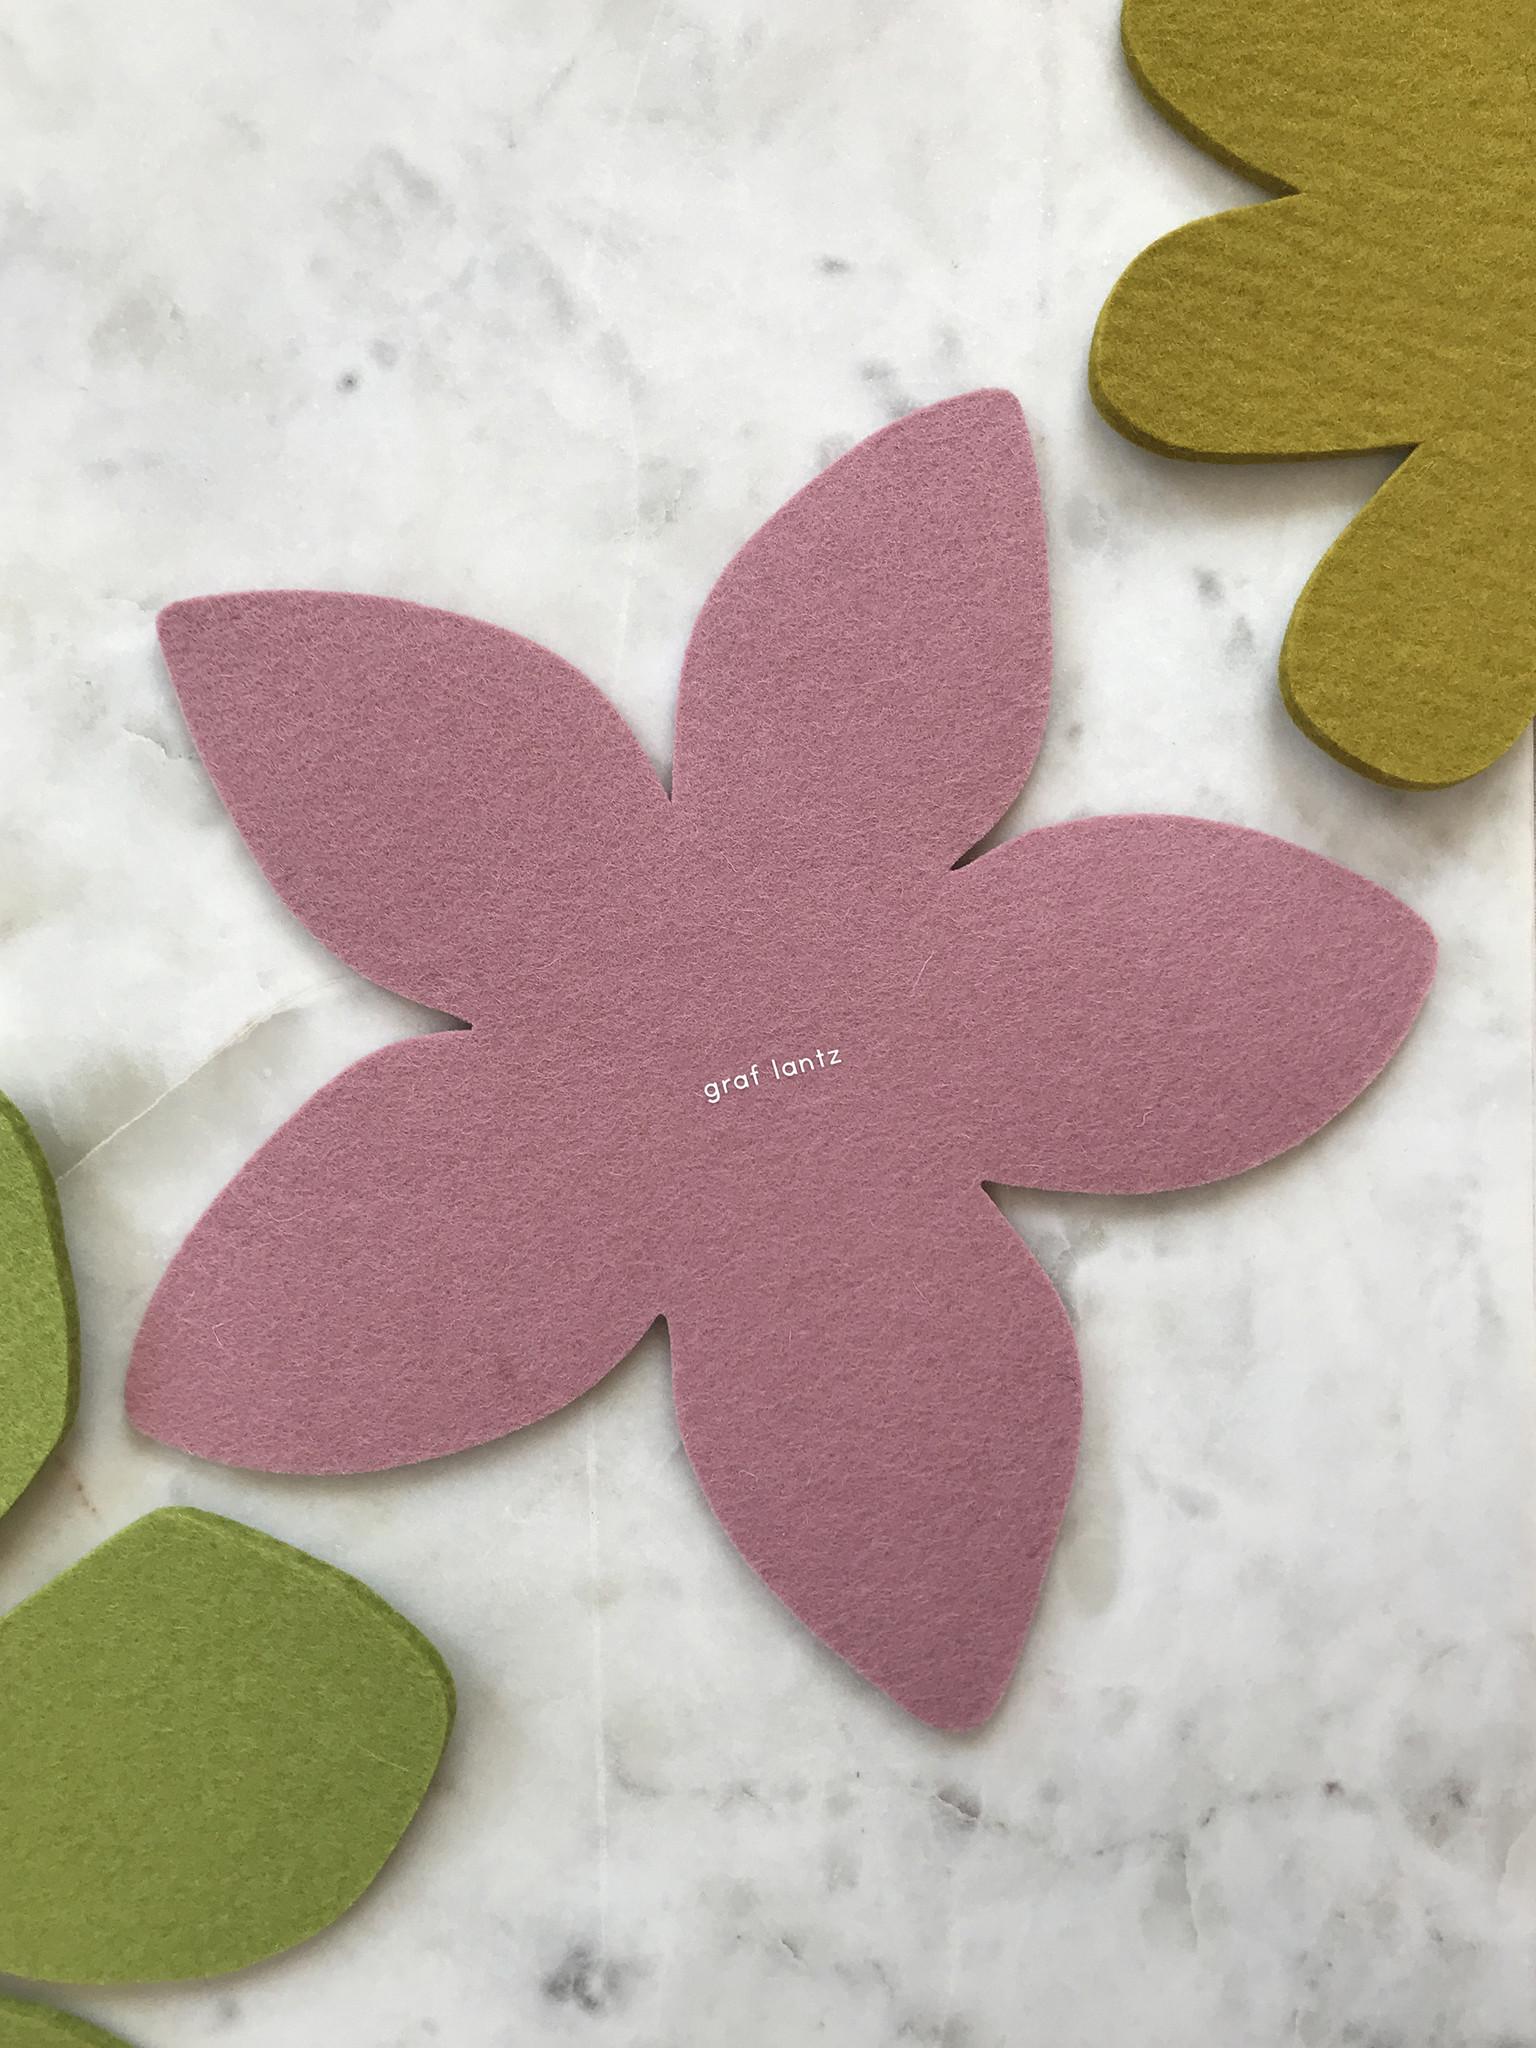 Graf & Lantz Felted Botanical Plumeria Trivet in Pink-1